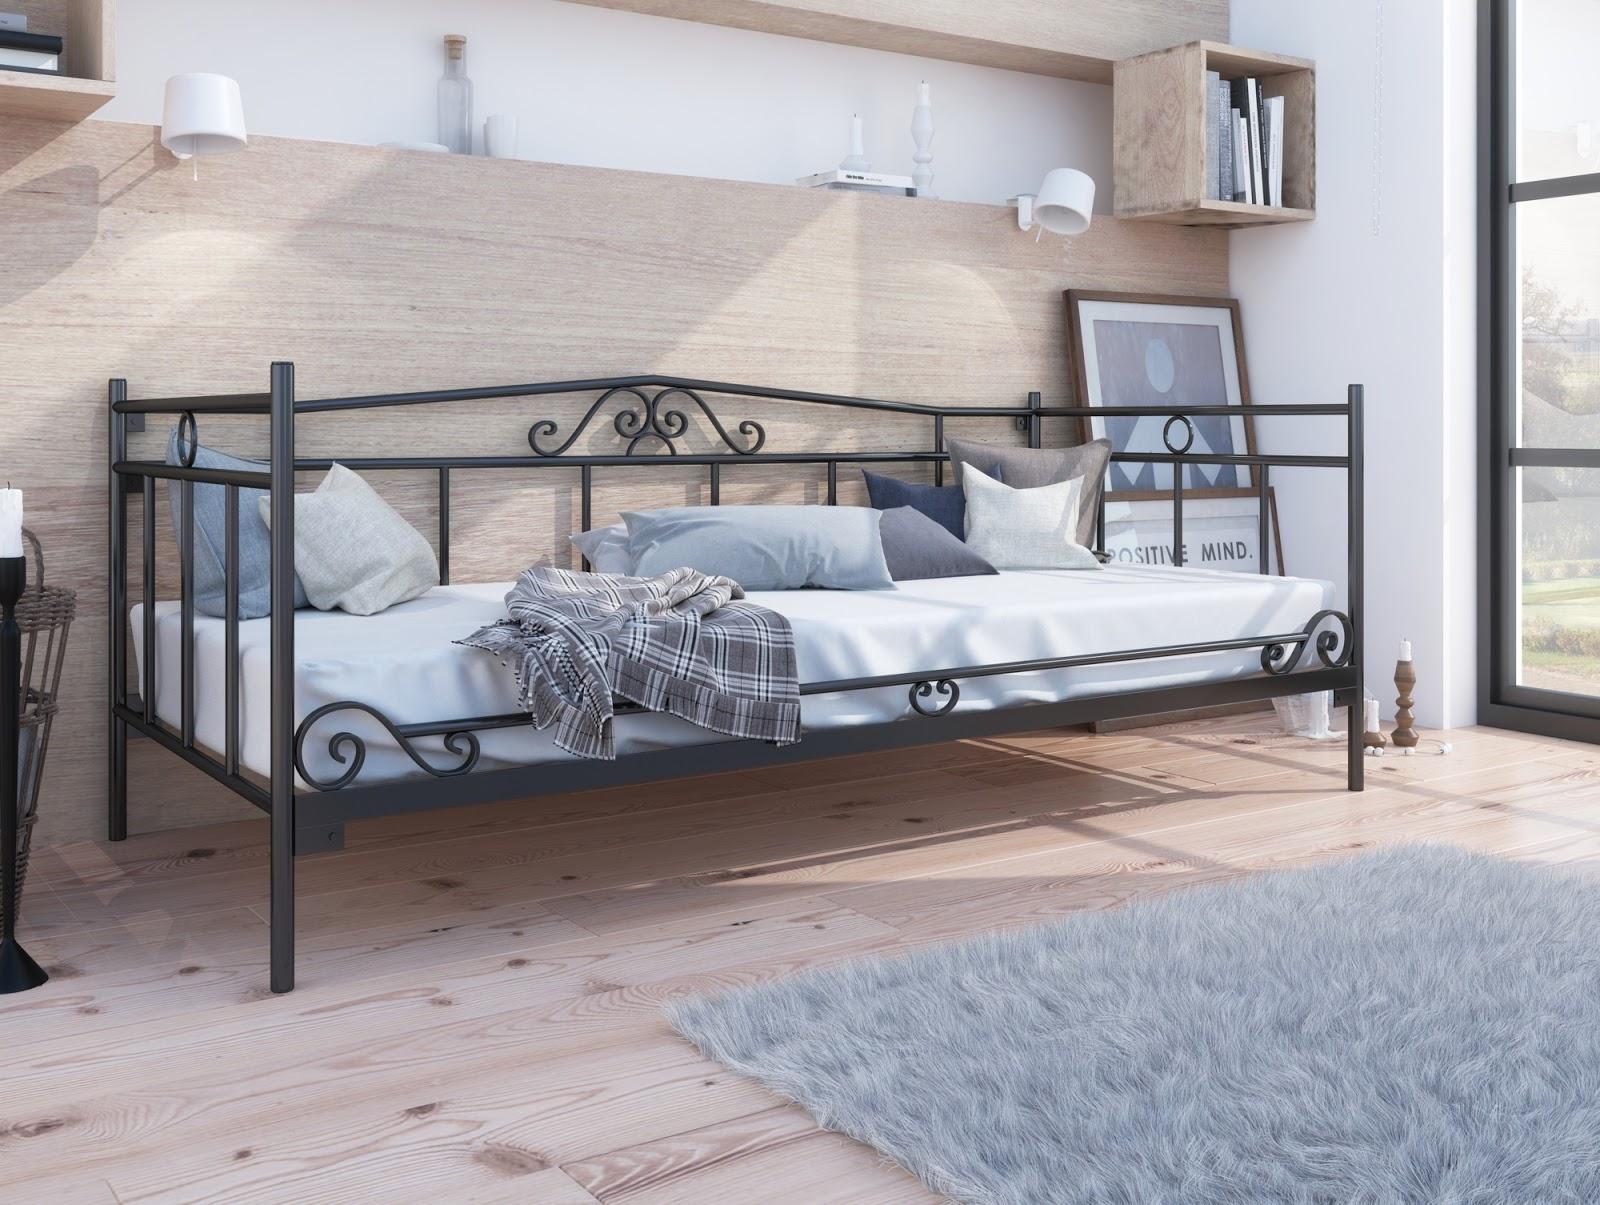 Łóżko metalowe sofa wzór 13